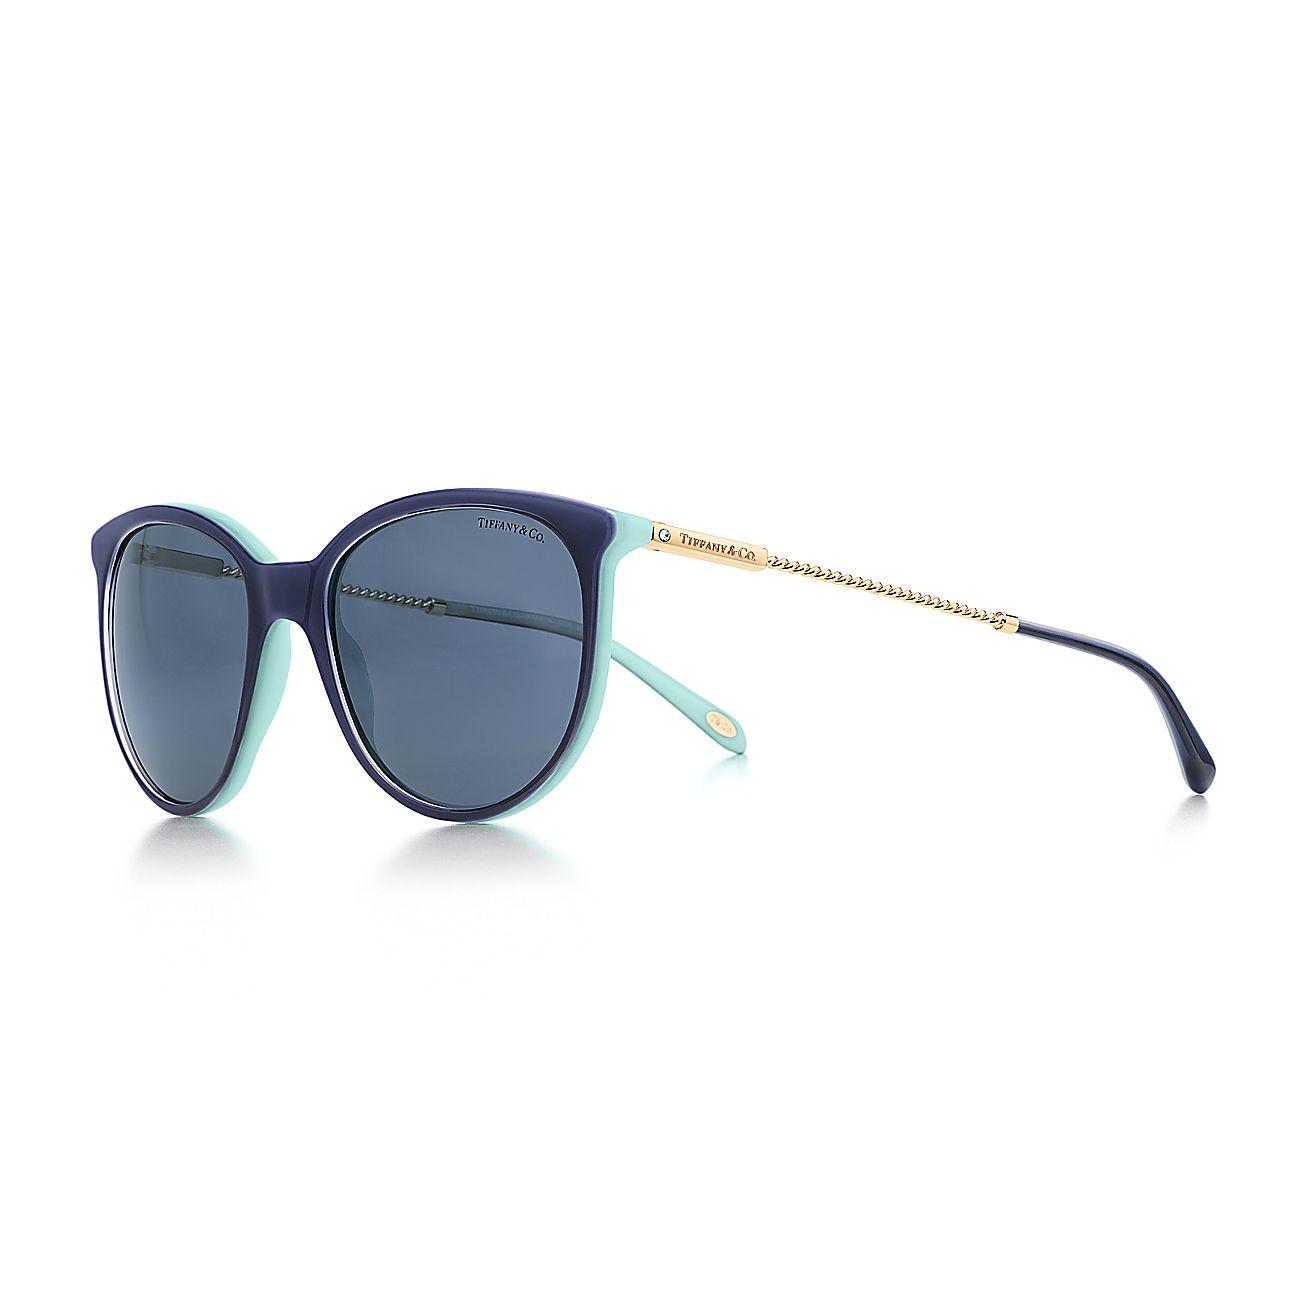 662bda50e5ac Tiffany Blue Sunglasses